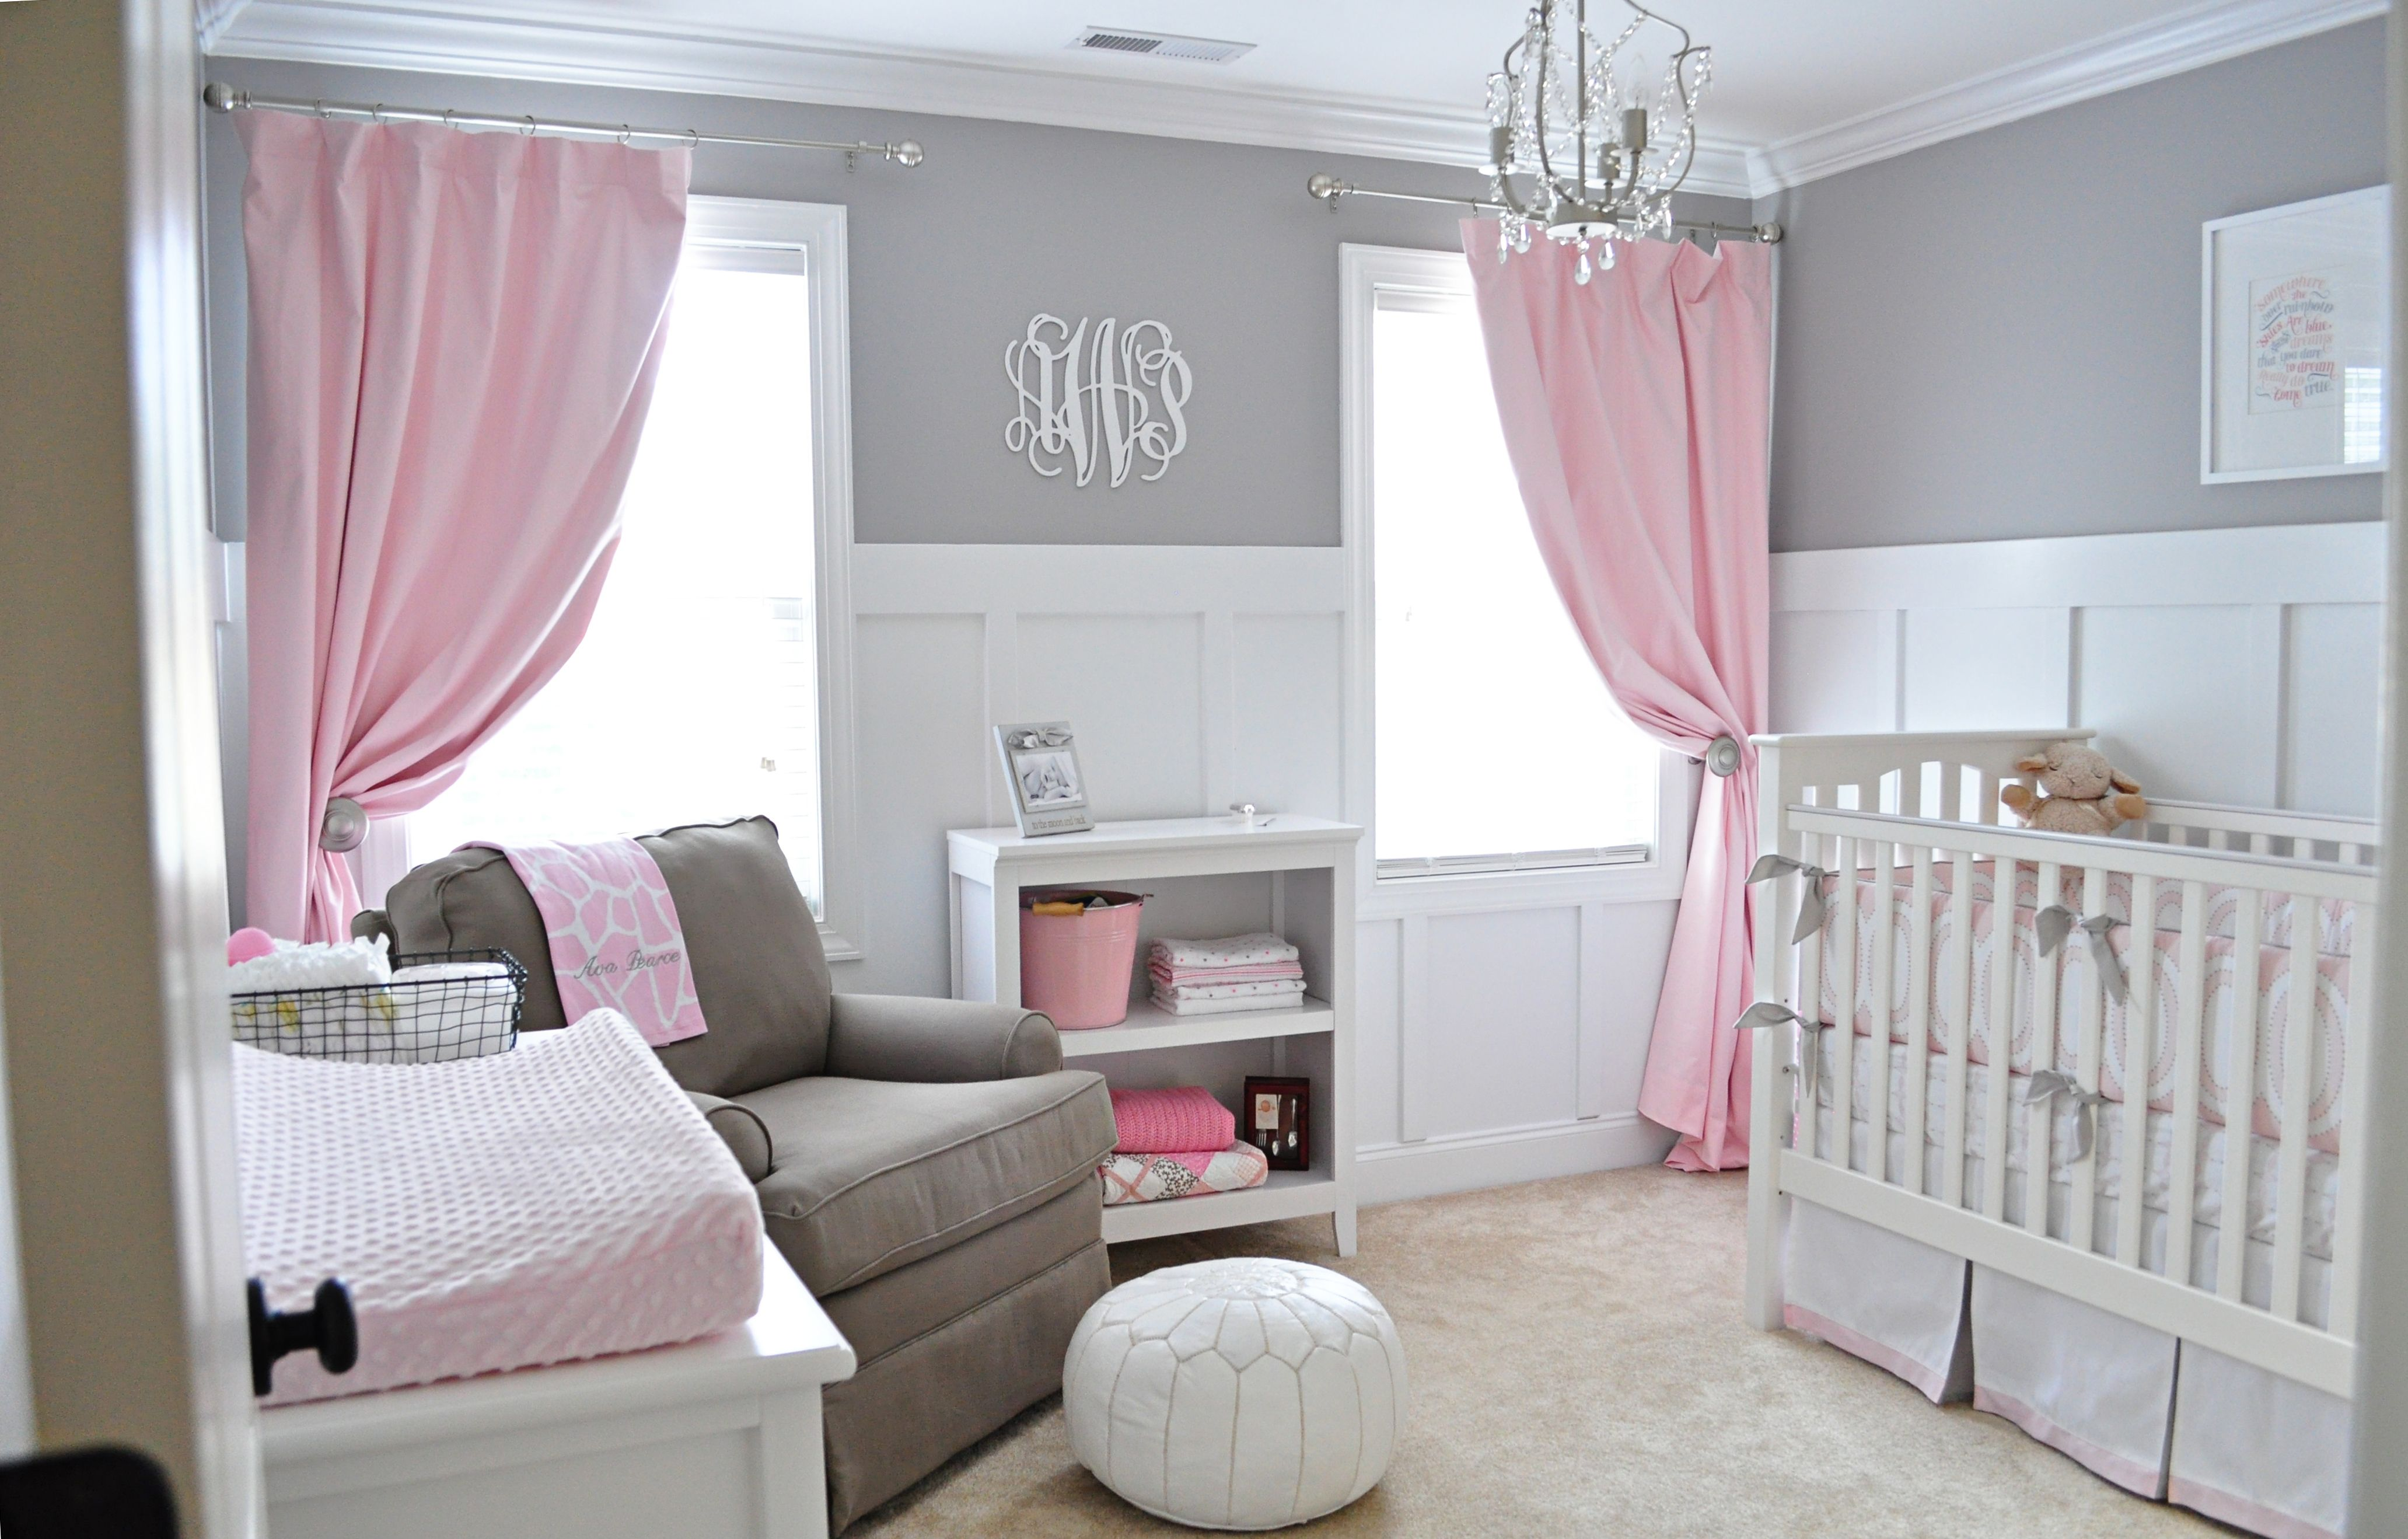 Avaus sweet gray and pink nursery one day pinterest nursery